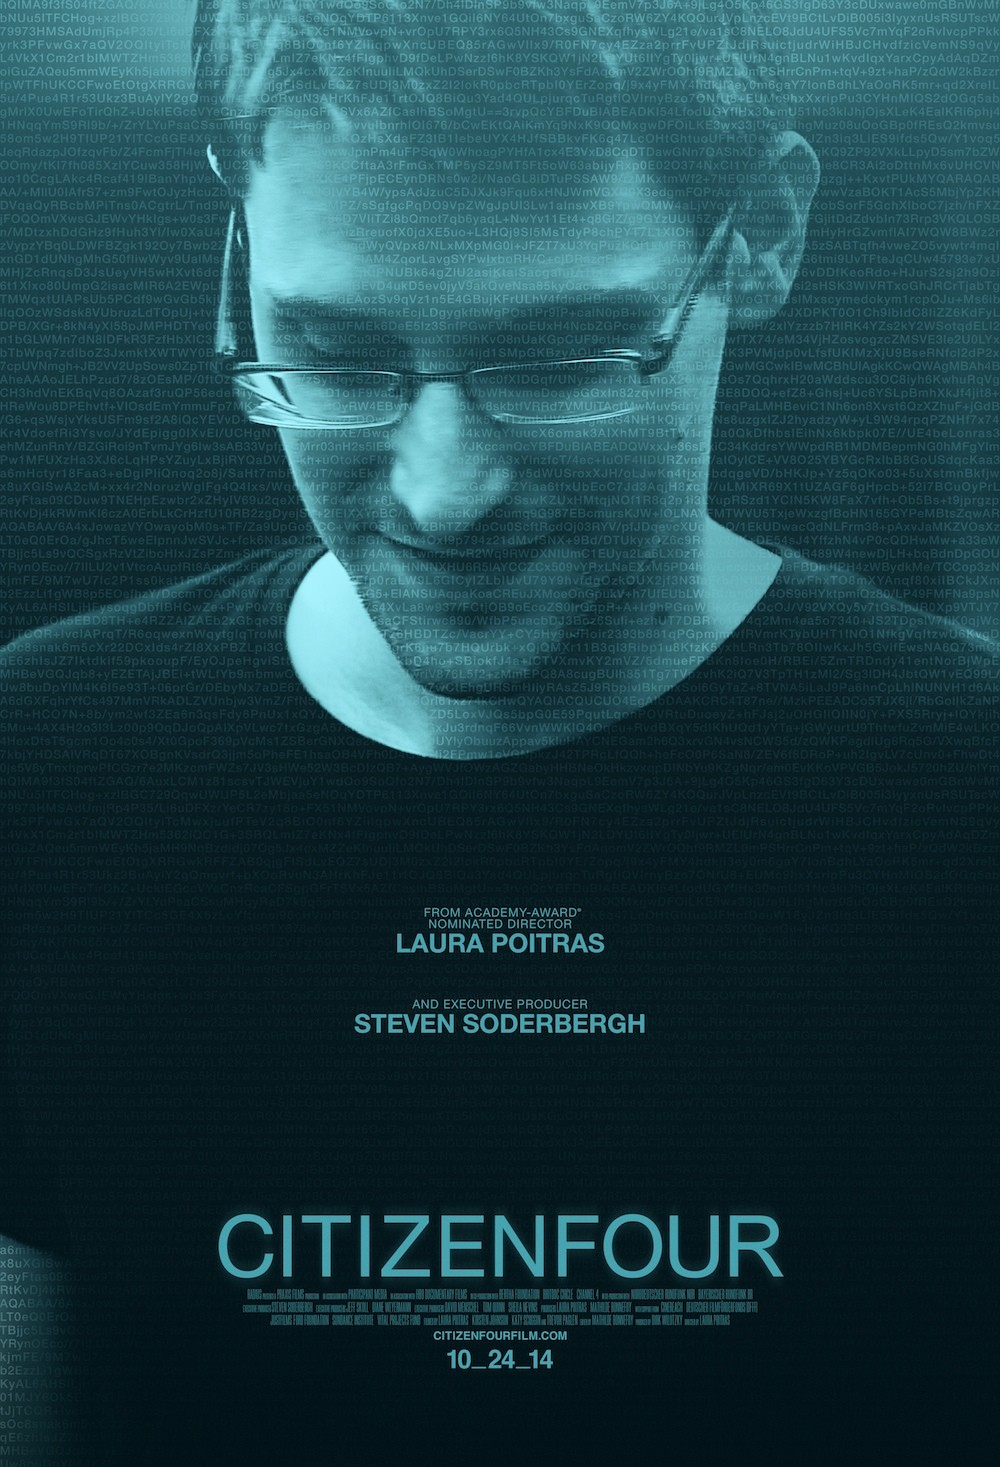 citizenfour-movie-poster